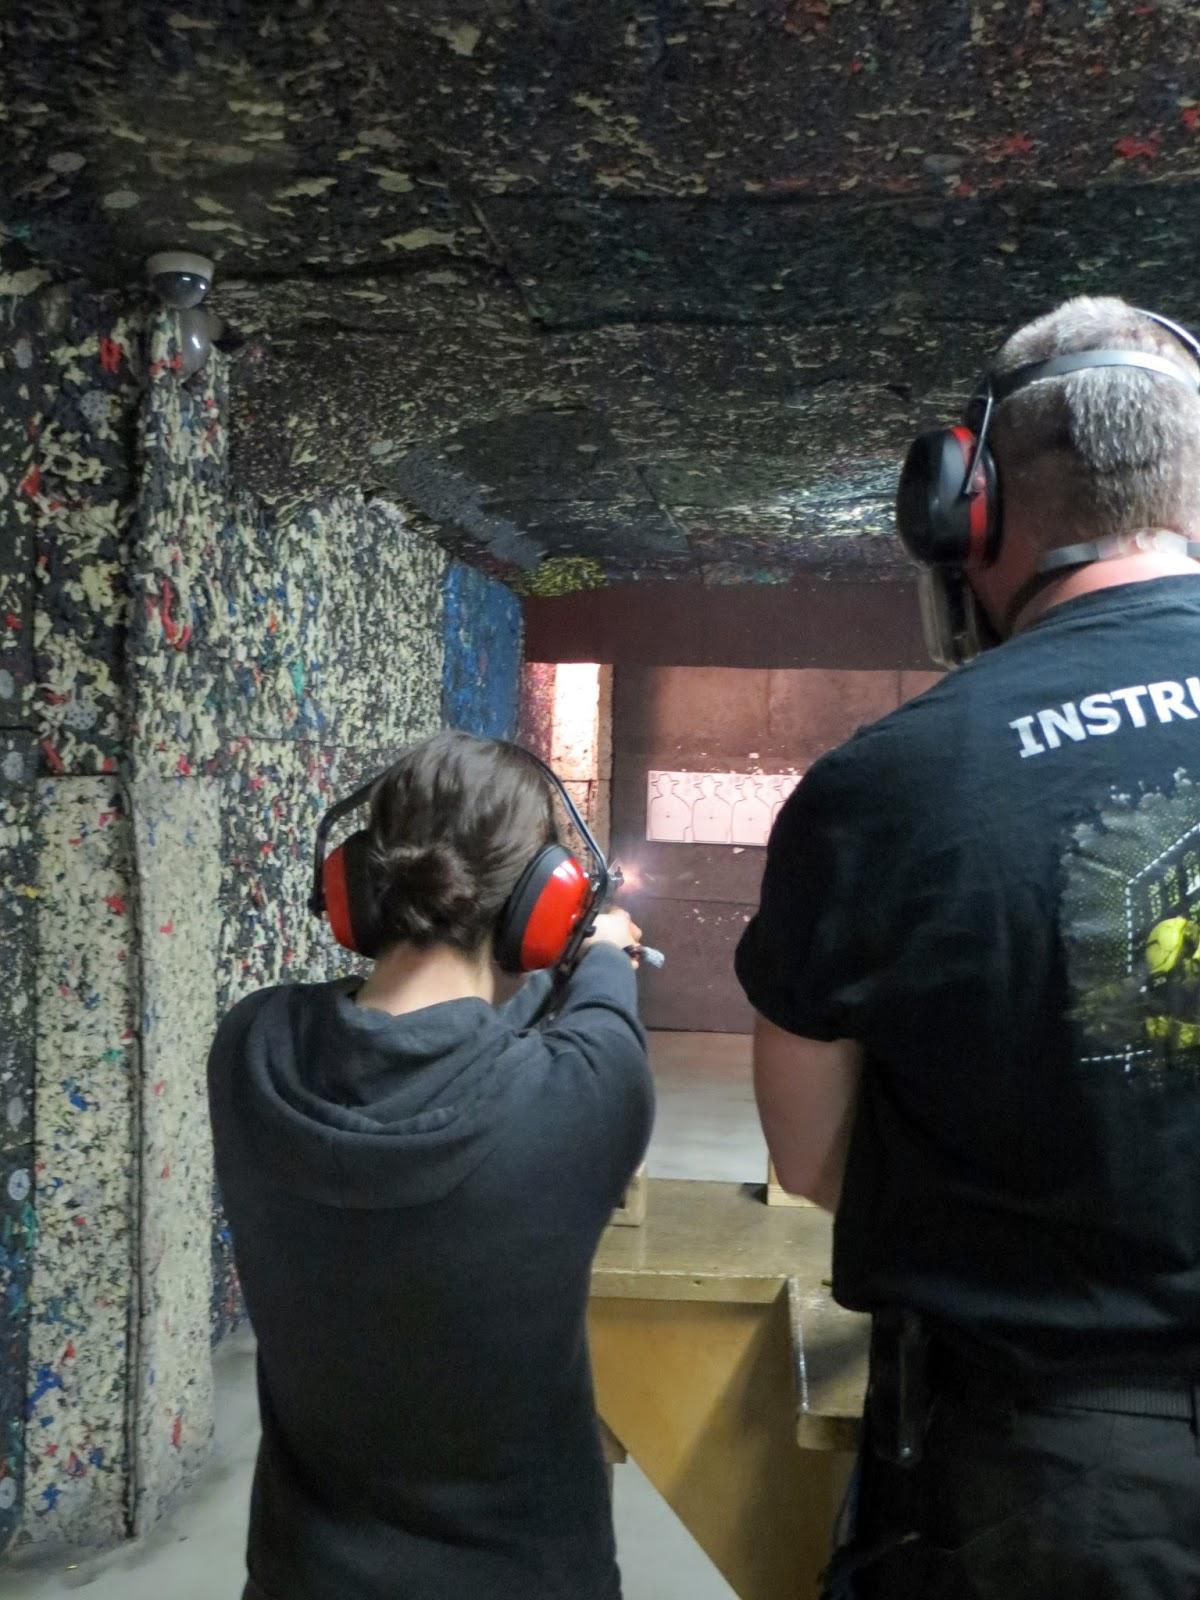 Celeritas shooting club, pistol, rifle, revolver, shooting, range, guns, firing, ak47, desert eagle, budapest, hungary, travel,